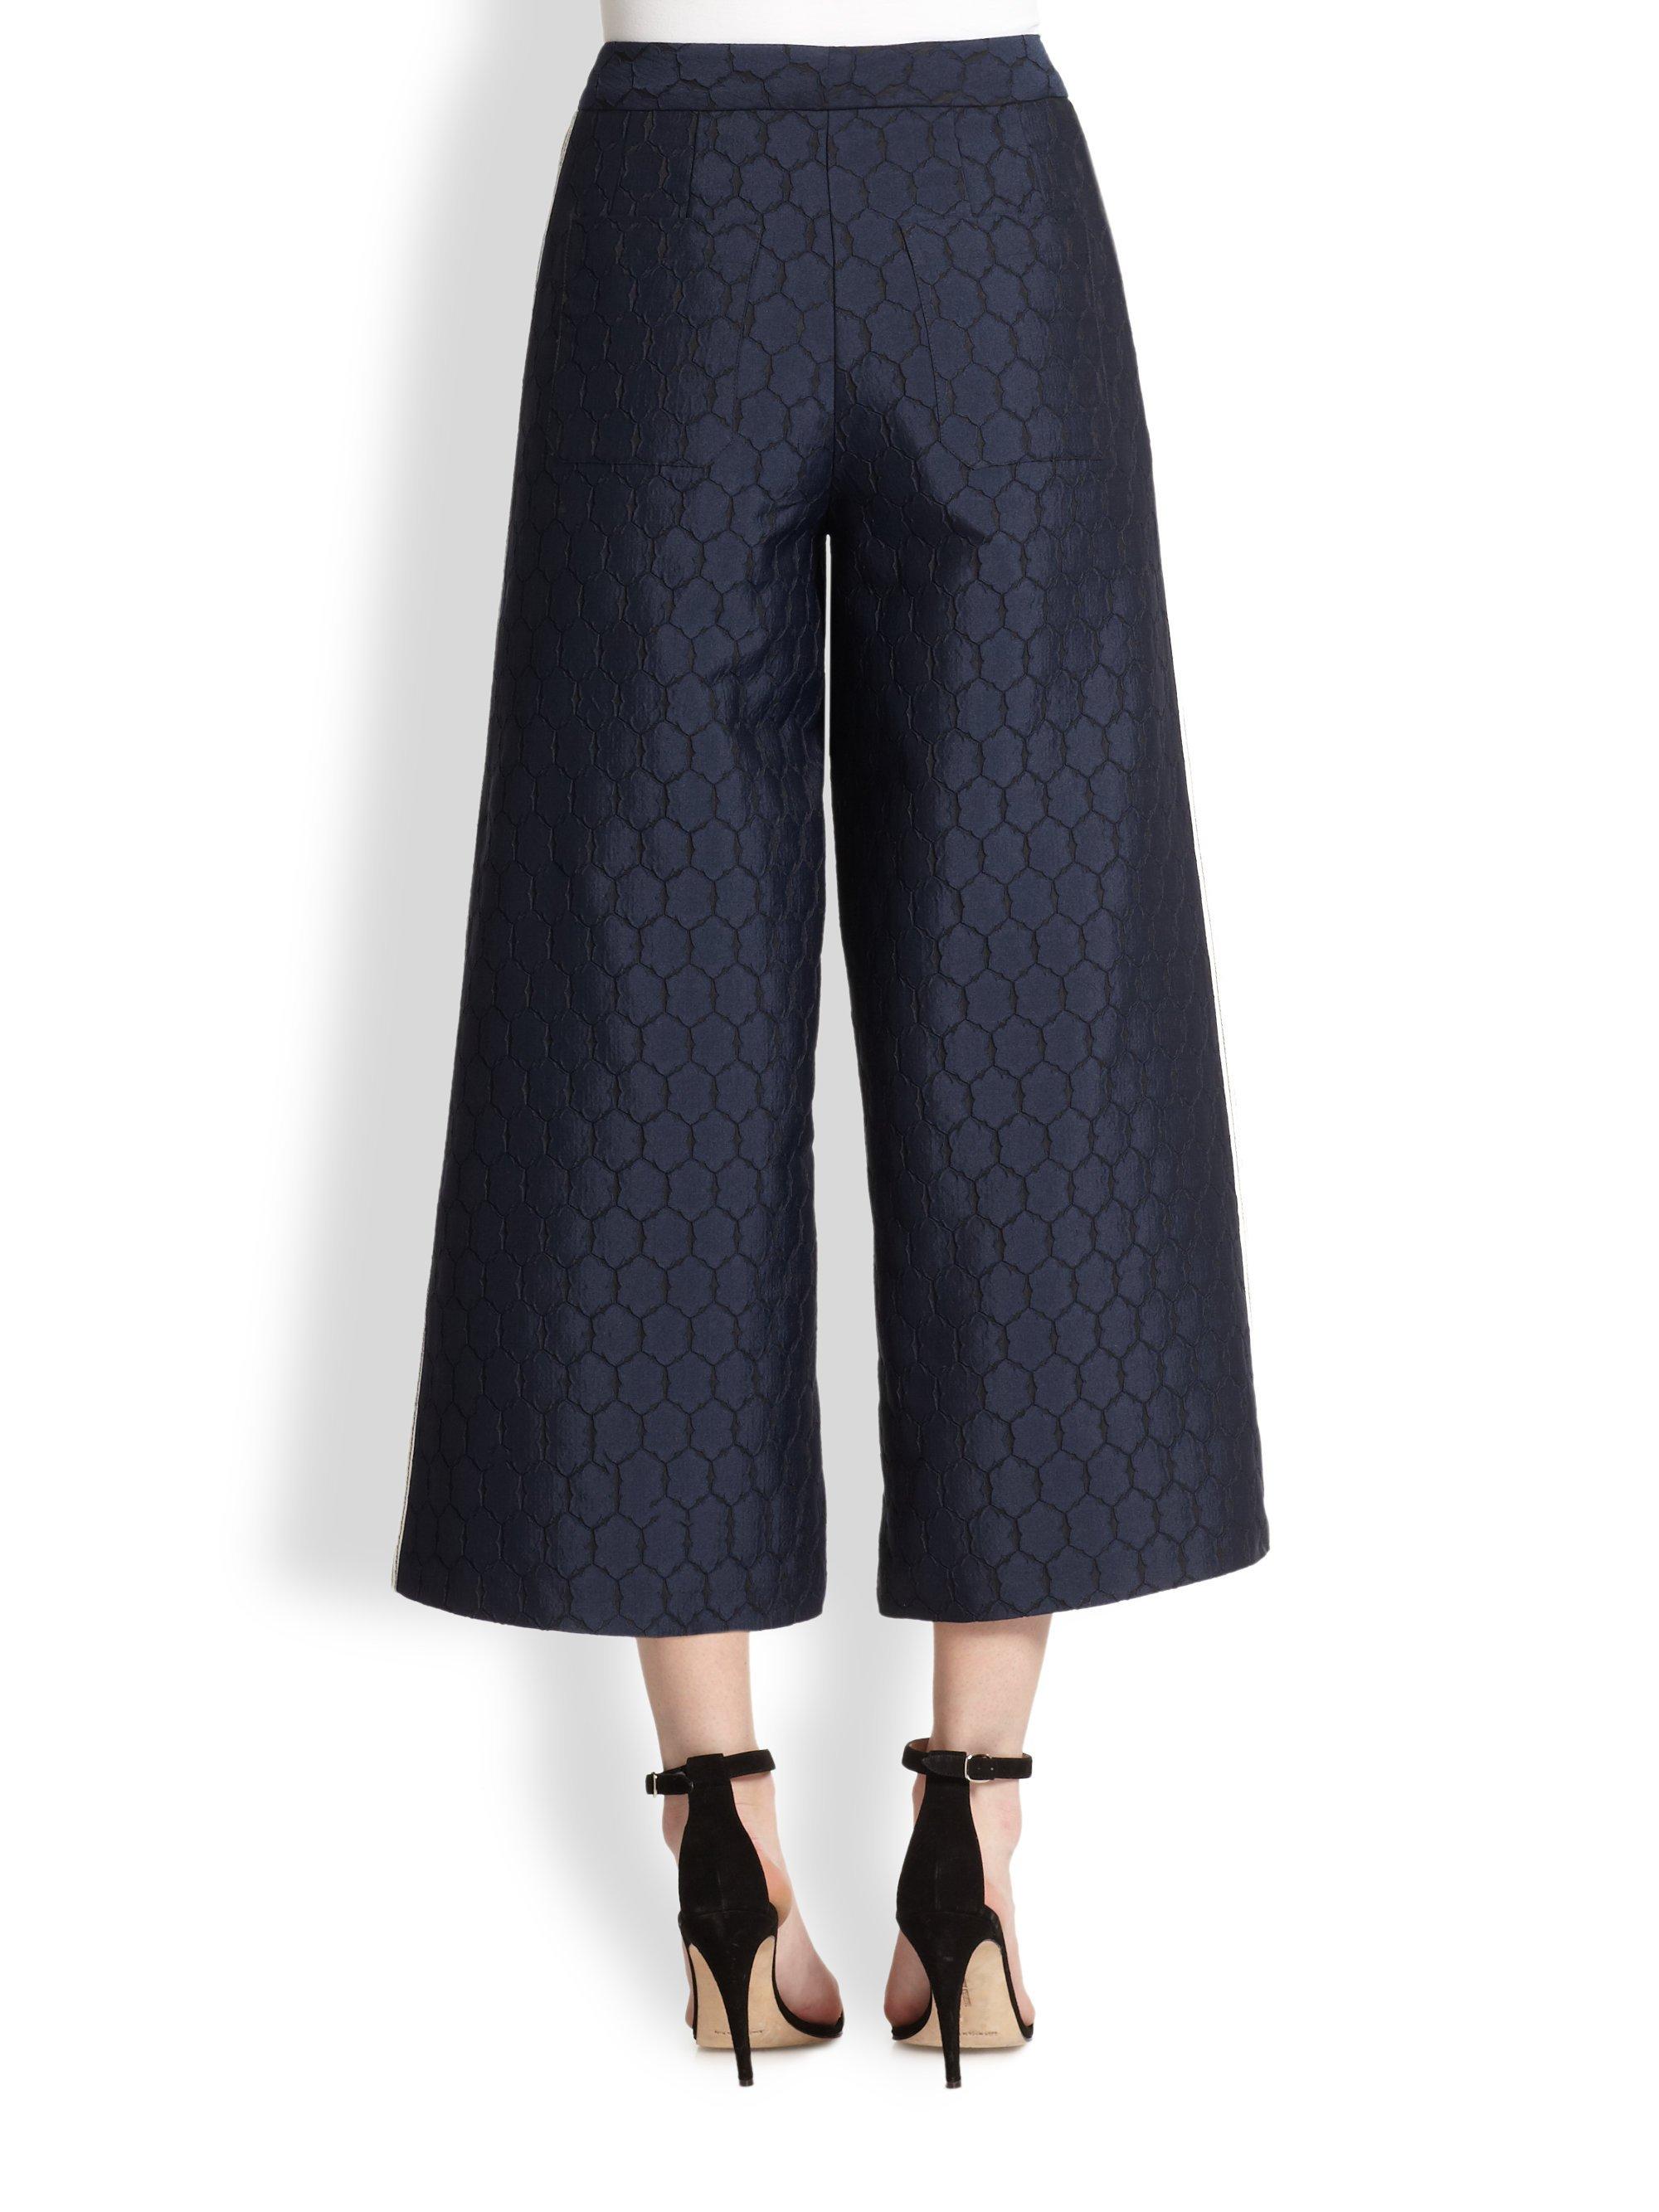 Sachin & babi Gerbera Wideleg Capri Pants in Blue | Lyst